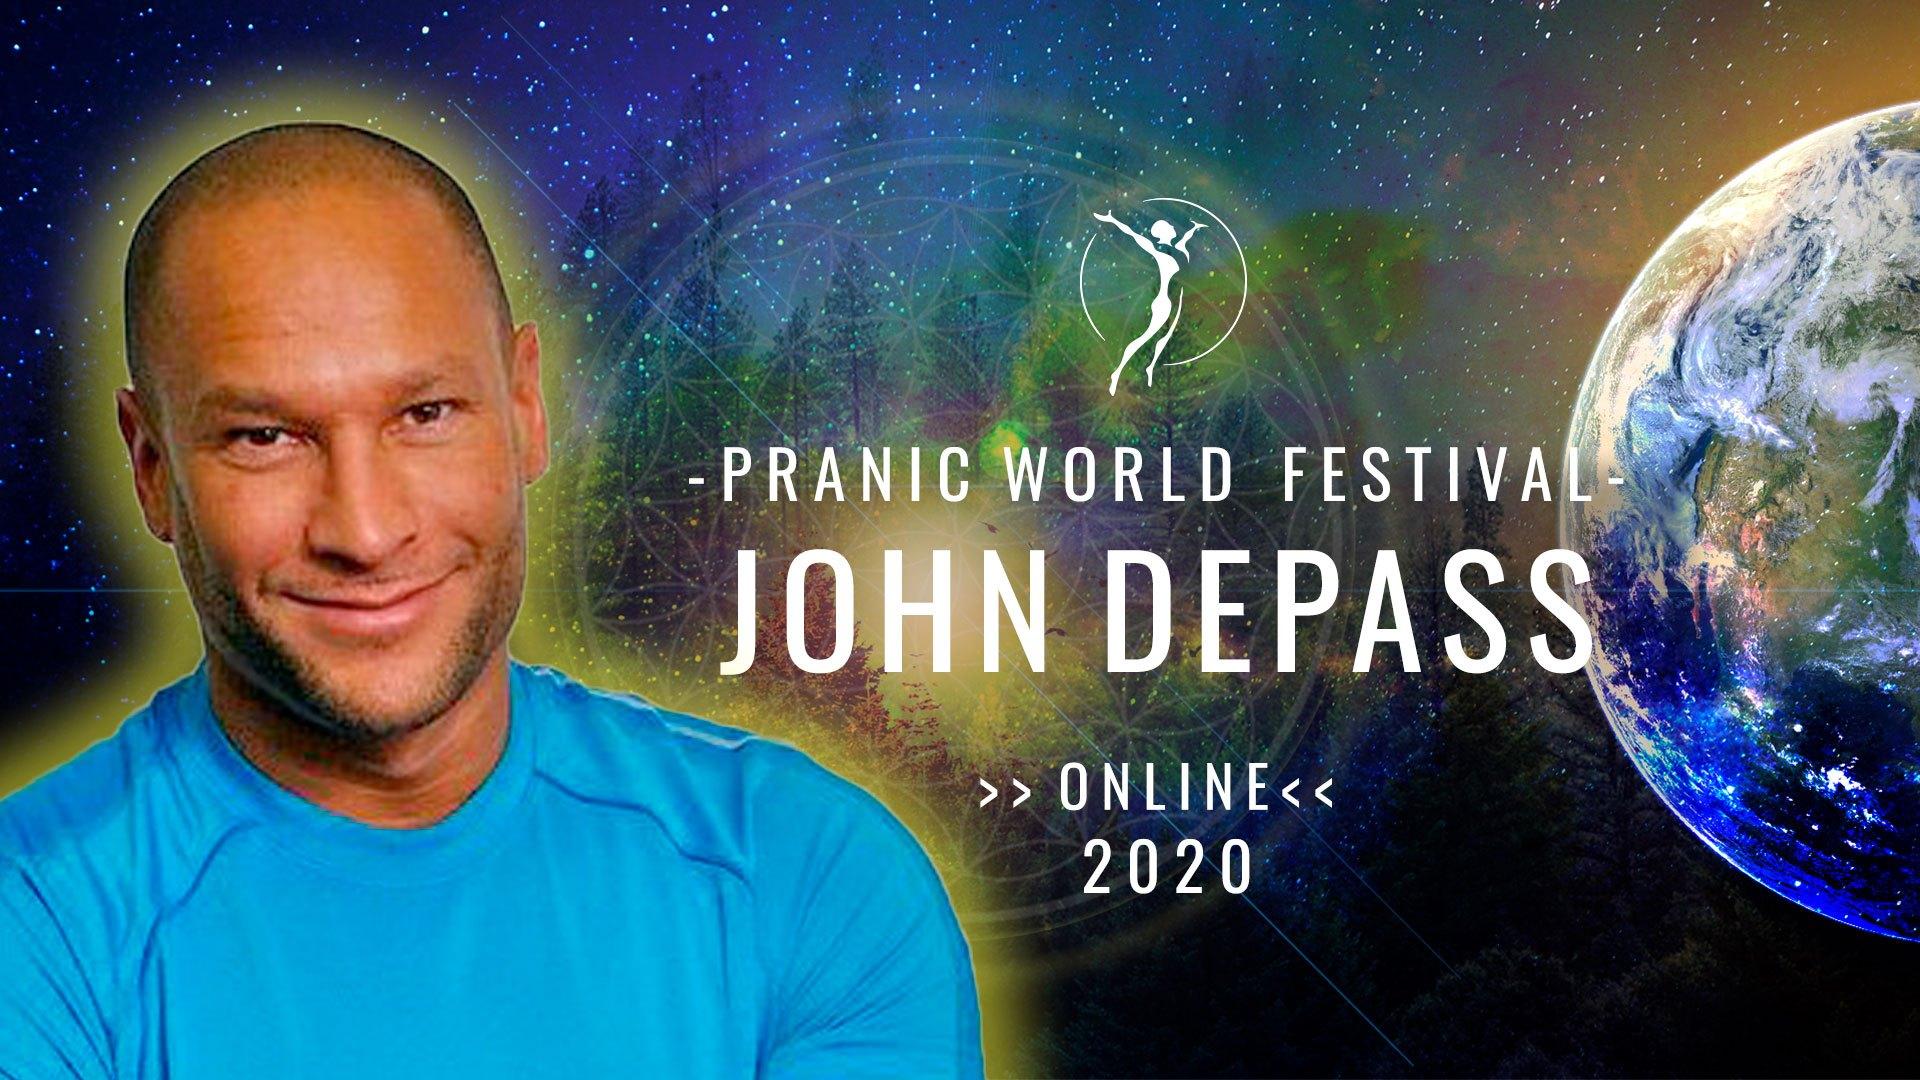 John DePass